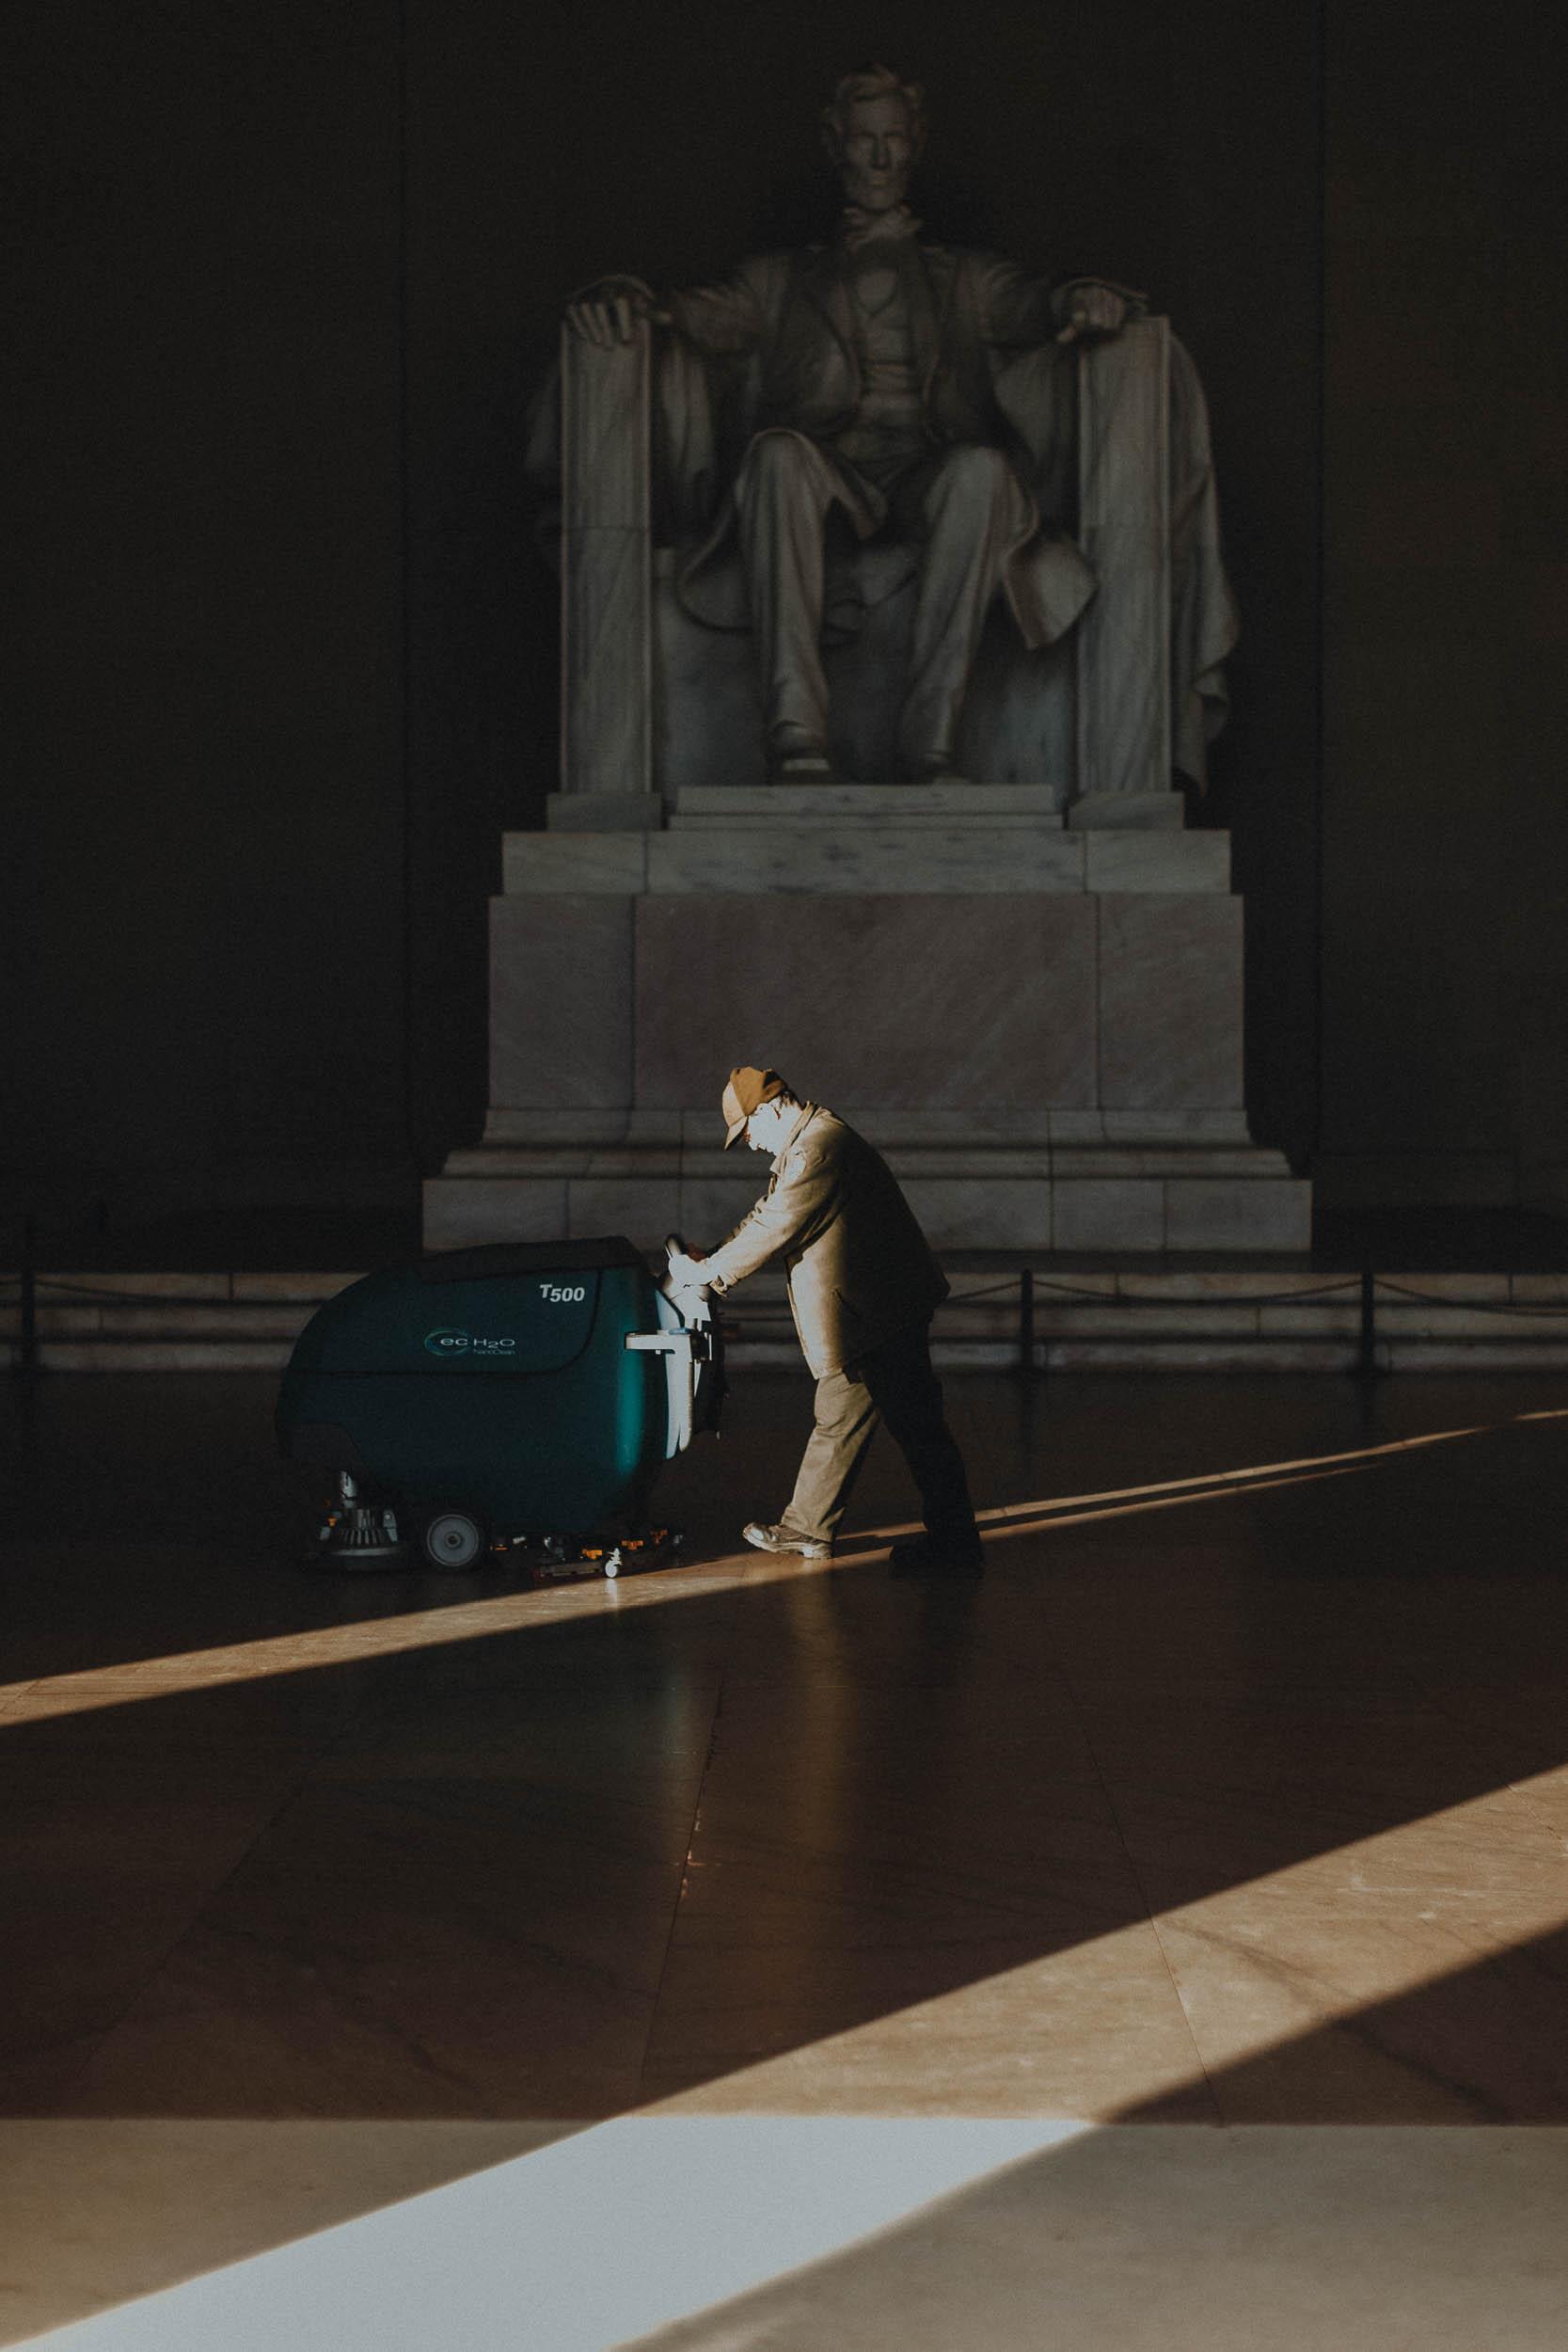 A an waxes the floor of the Lincoln Memorial